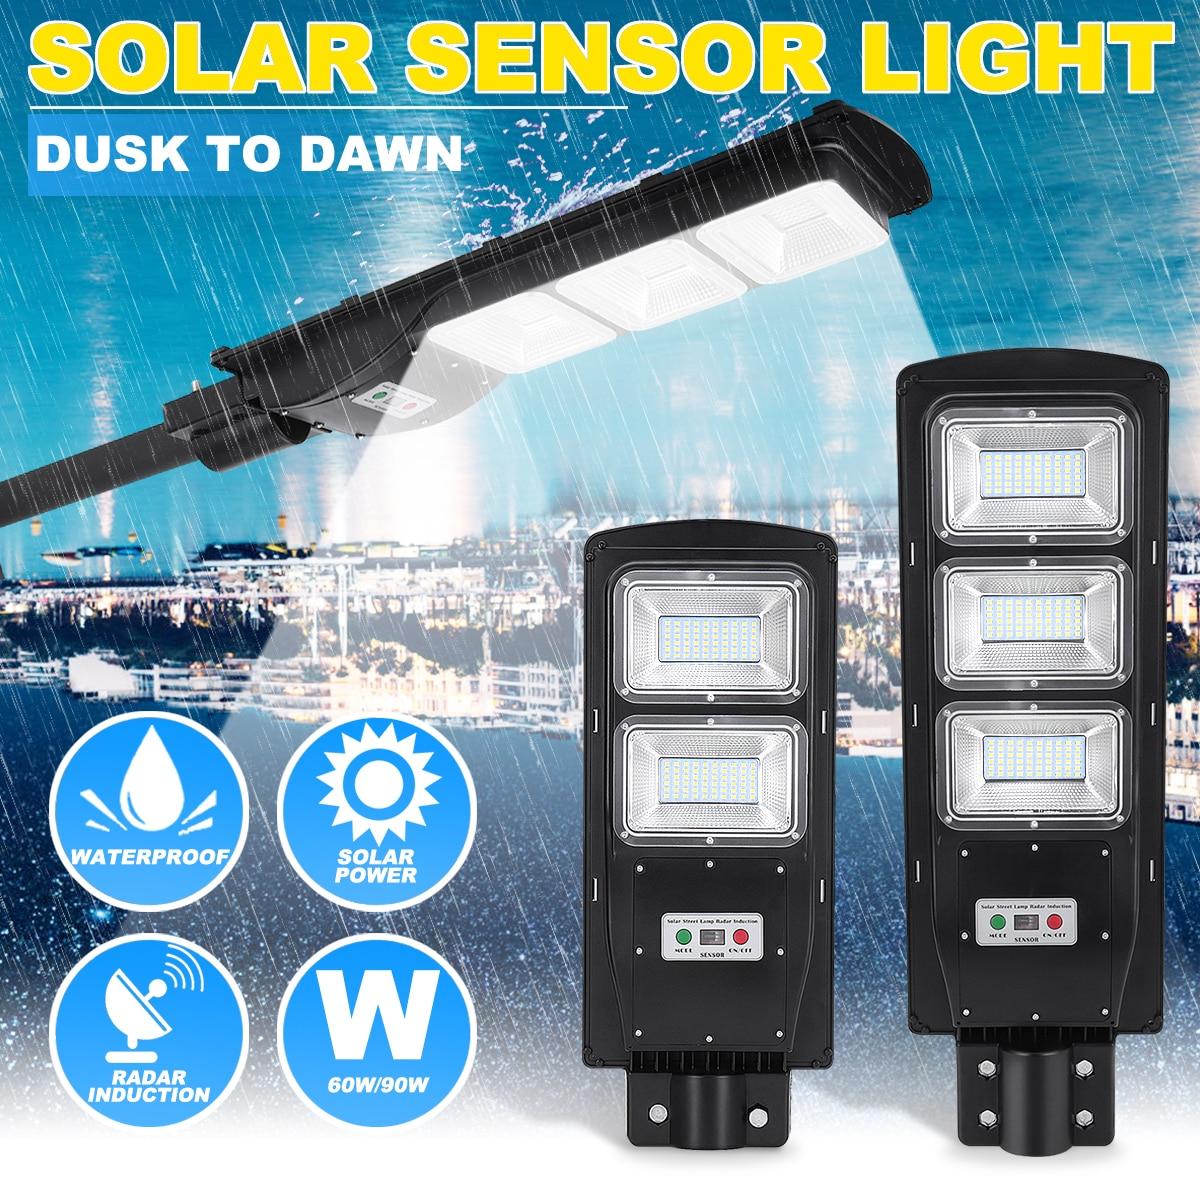 LED Solar Light Radar PIR Motion Sensor Wall Timing Lamp+Remote Waterproof 30/60/90W LED Street Light For Plaza Garden Yard